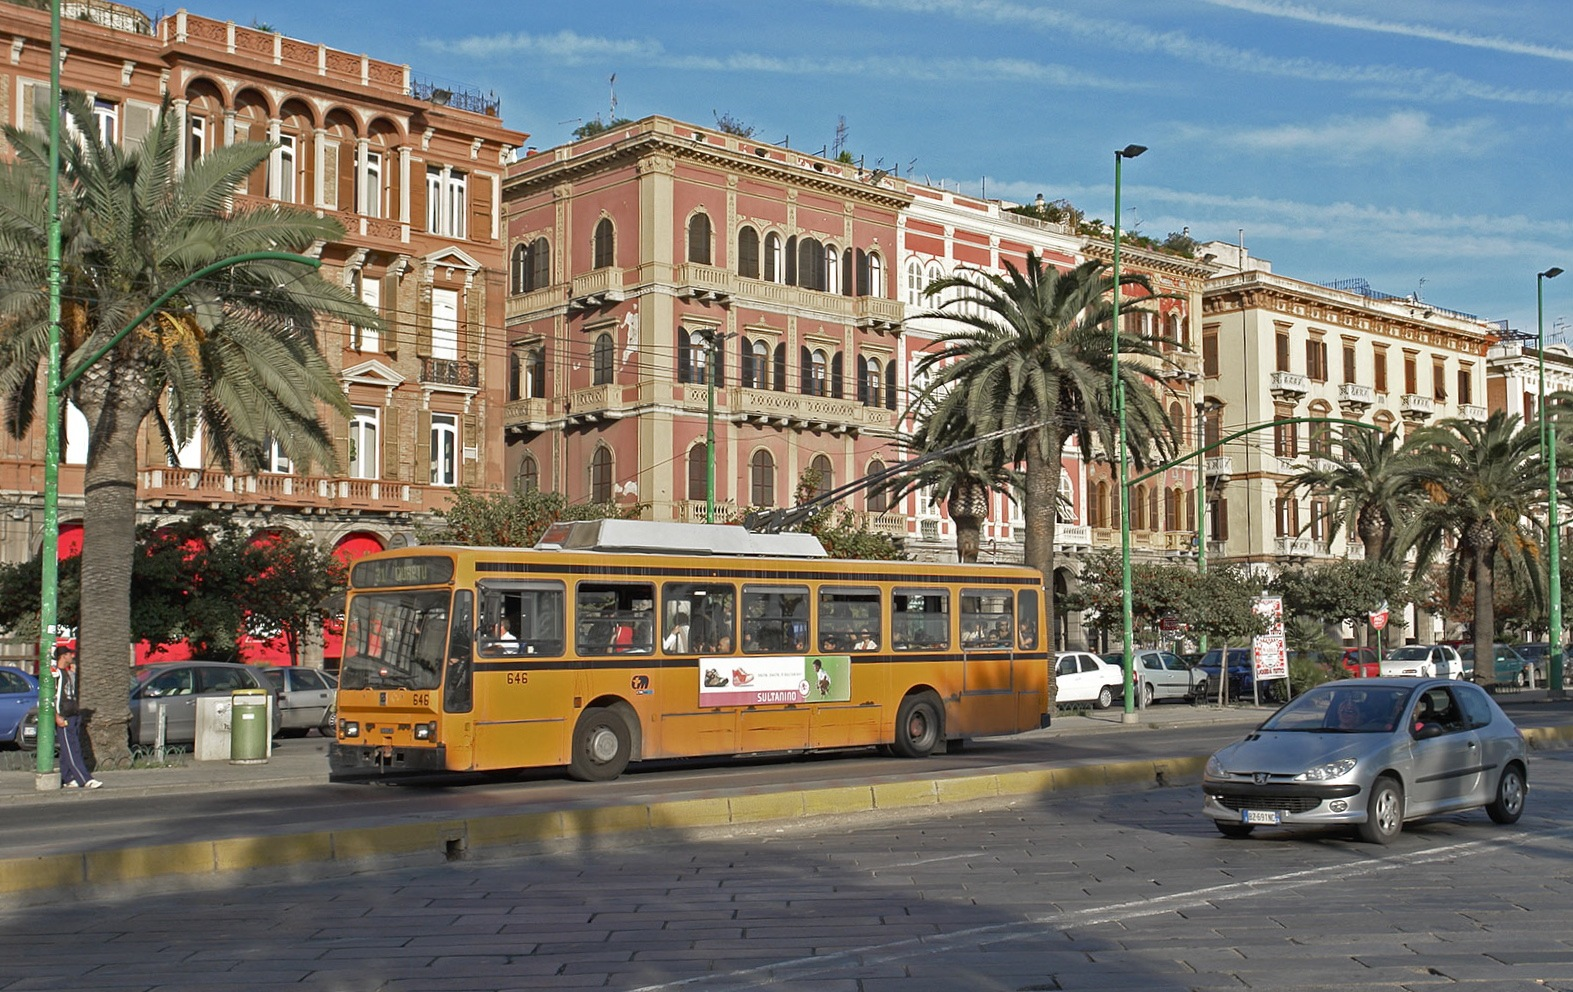 Città metropolitana Cagliari - photo credit: Hans Peter Schaefer